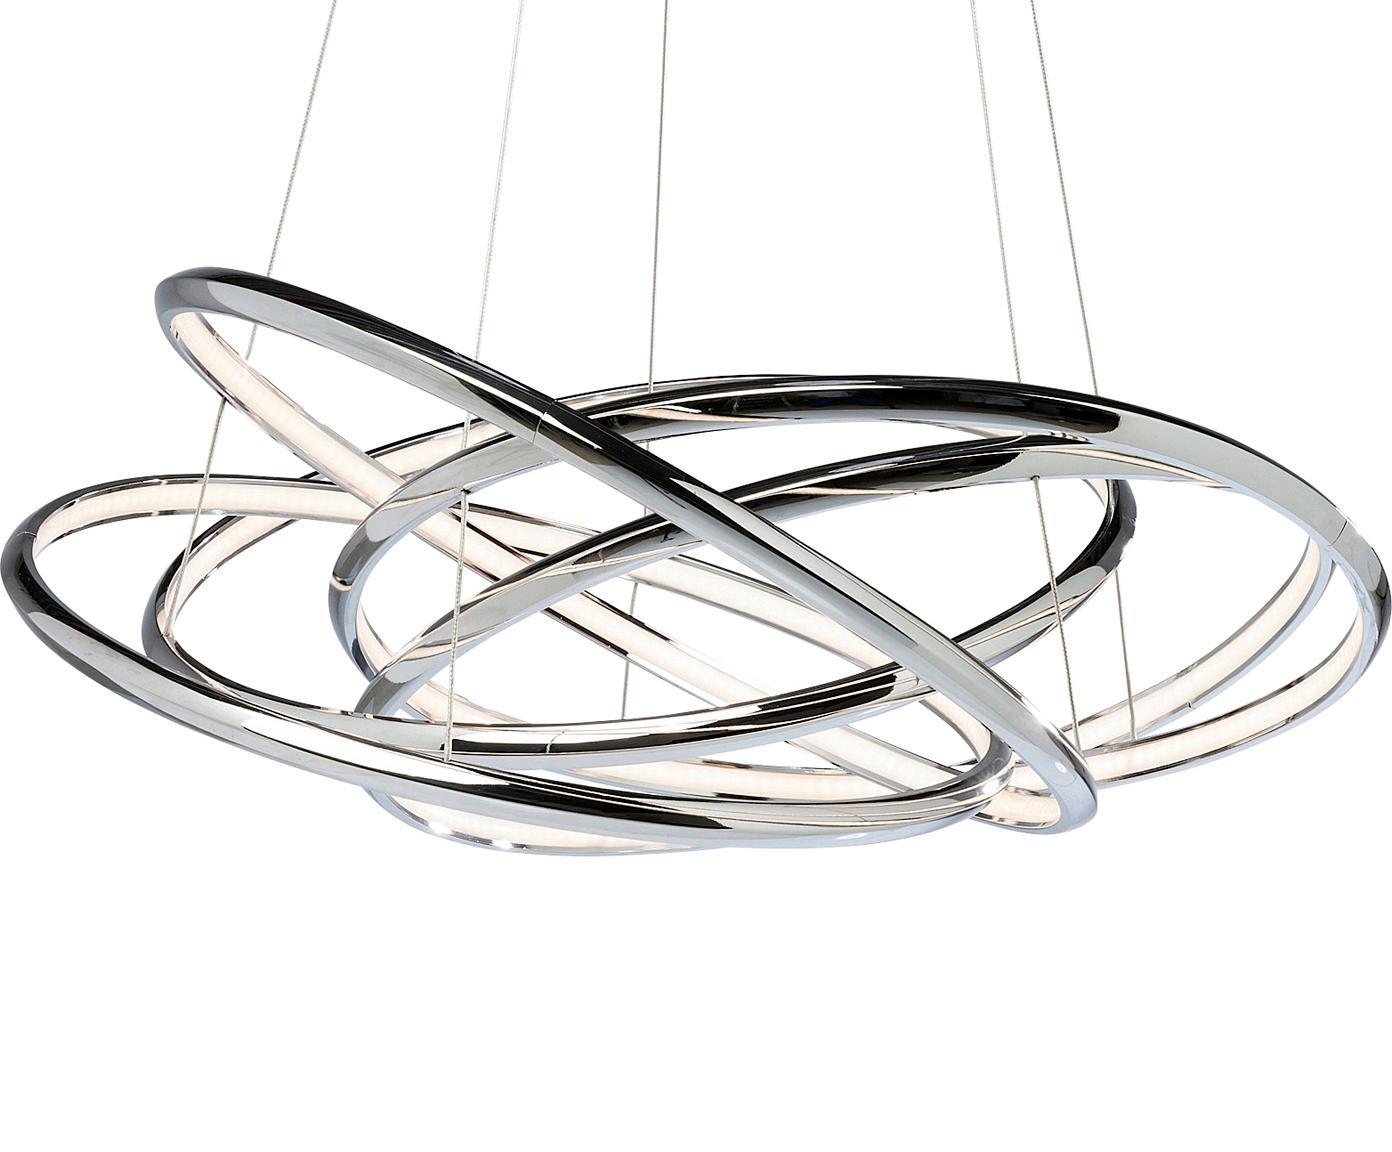 Lámpara de techo LED Saturn, estilo morderno, Pantalla: aluminio, cromado, Anclaje: acero, latón, Plateado, An 75 x Al 120 cm